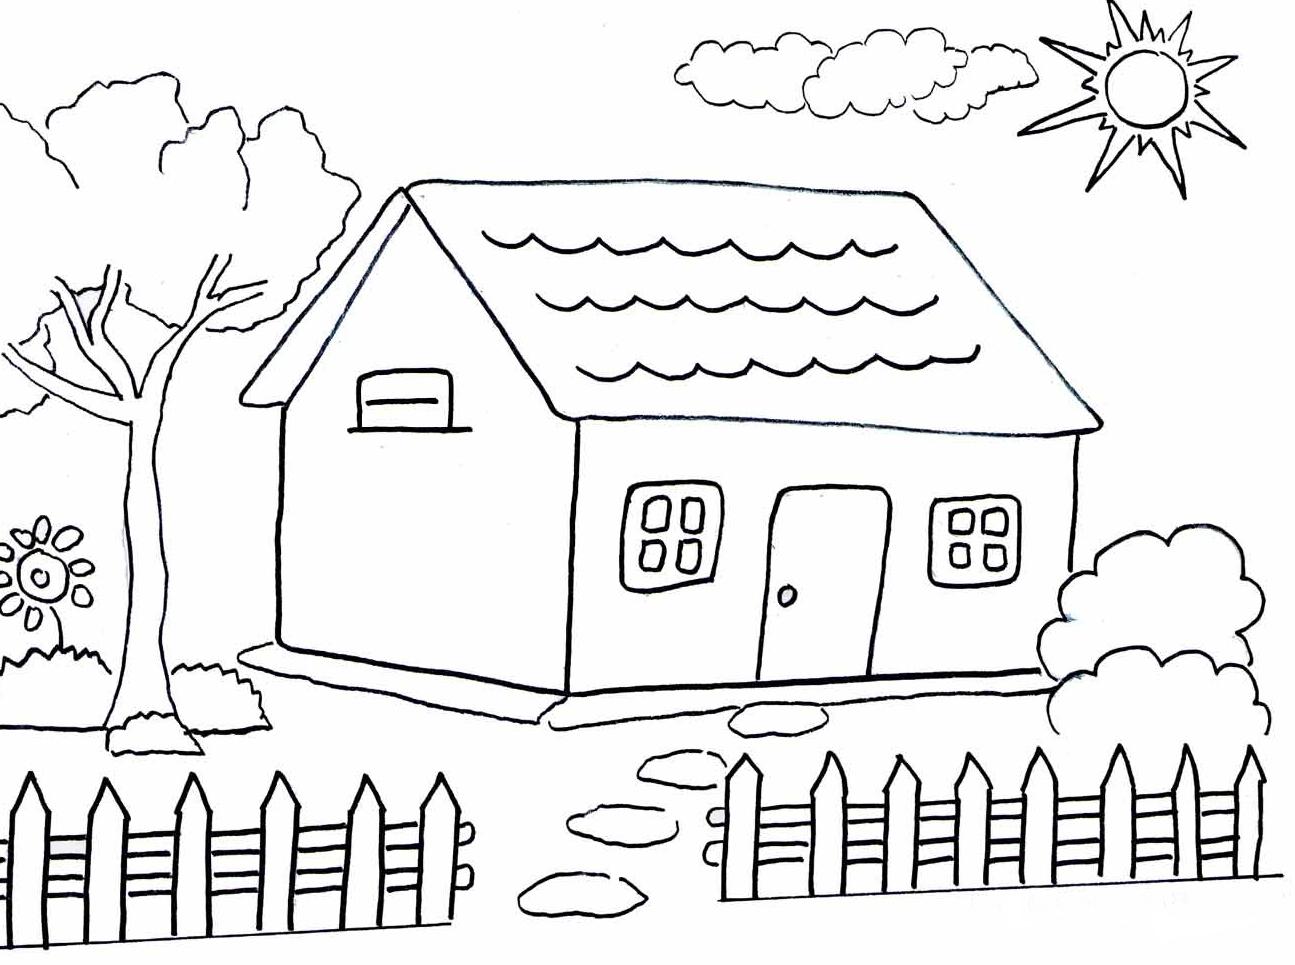 Gambar Mewarnai Hitam Putih Rumah Adat Jawa Anak Sd Tk Paud Terbaru